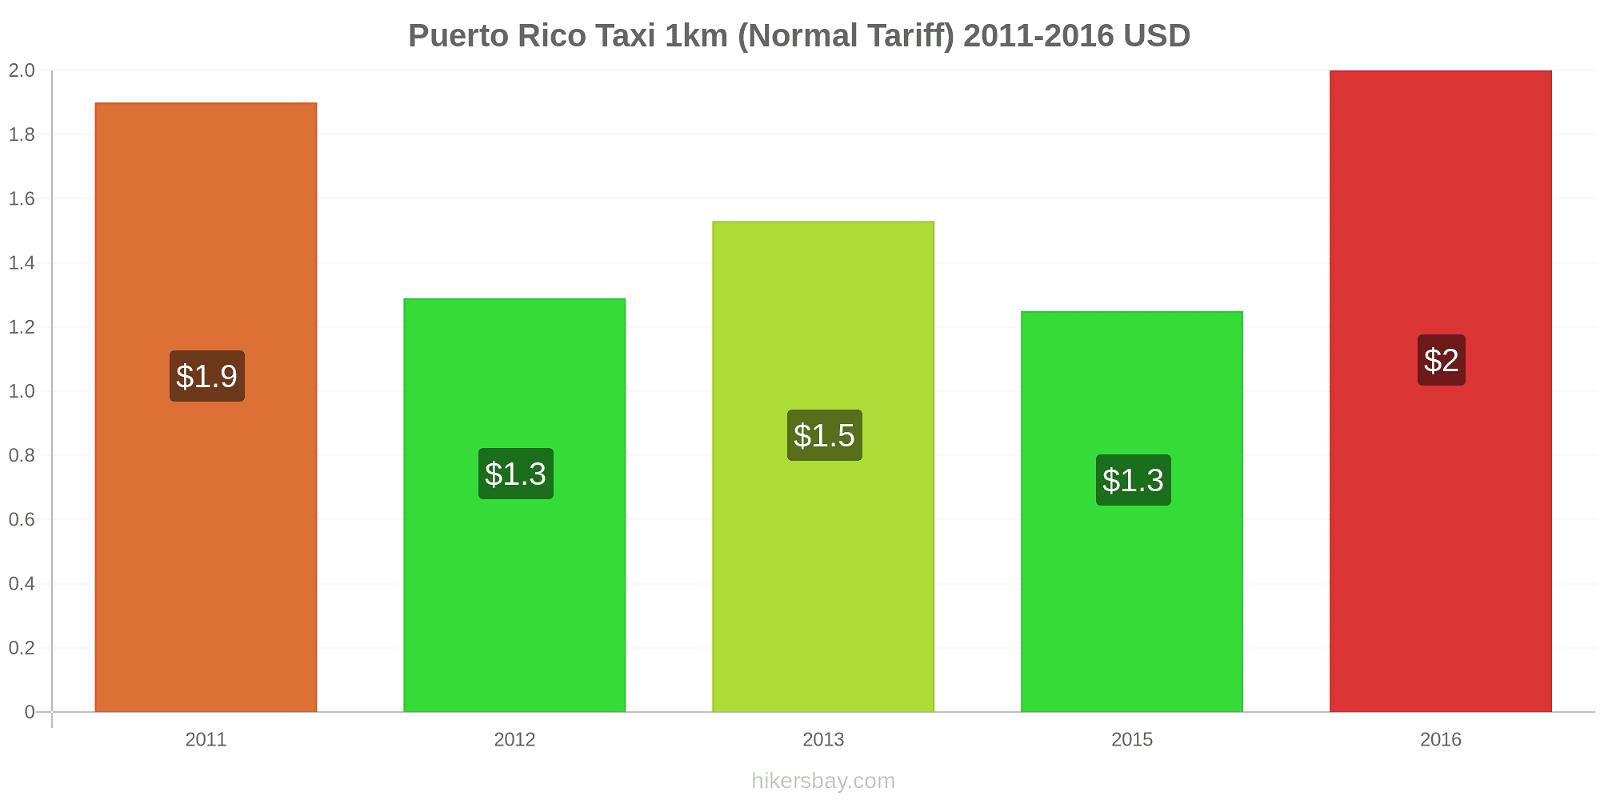 Puerto Rico price changes Taxi 1km (Normal Tariff) hikersbay.com